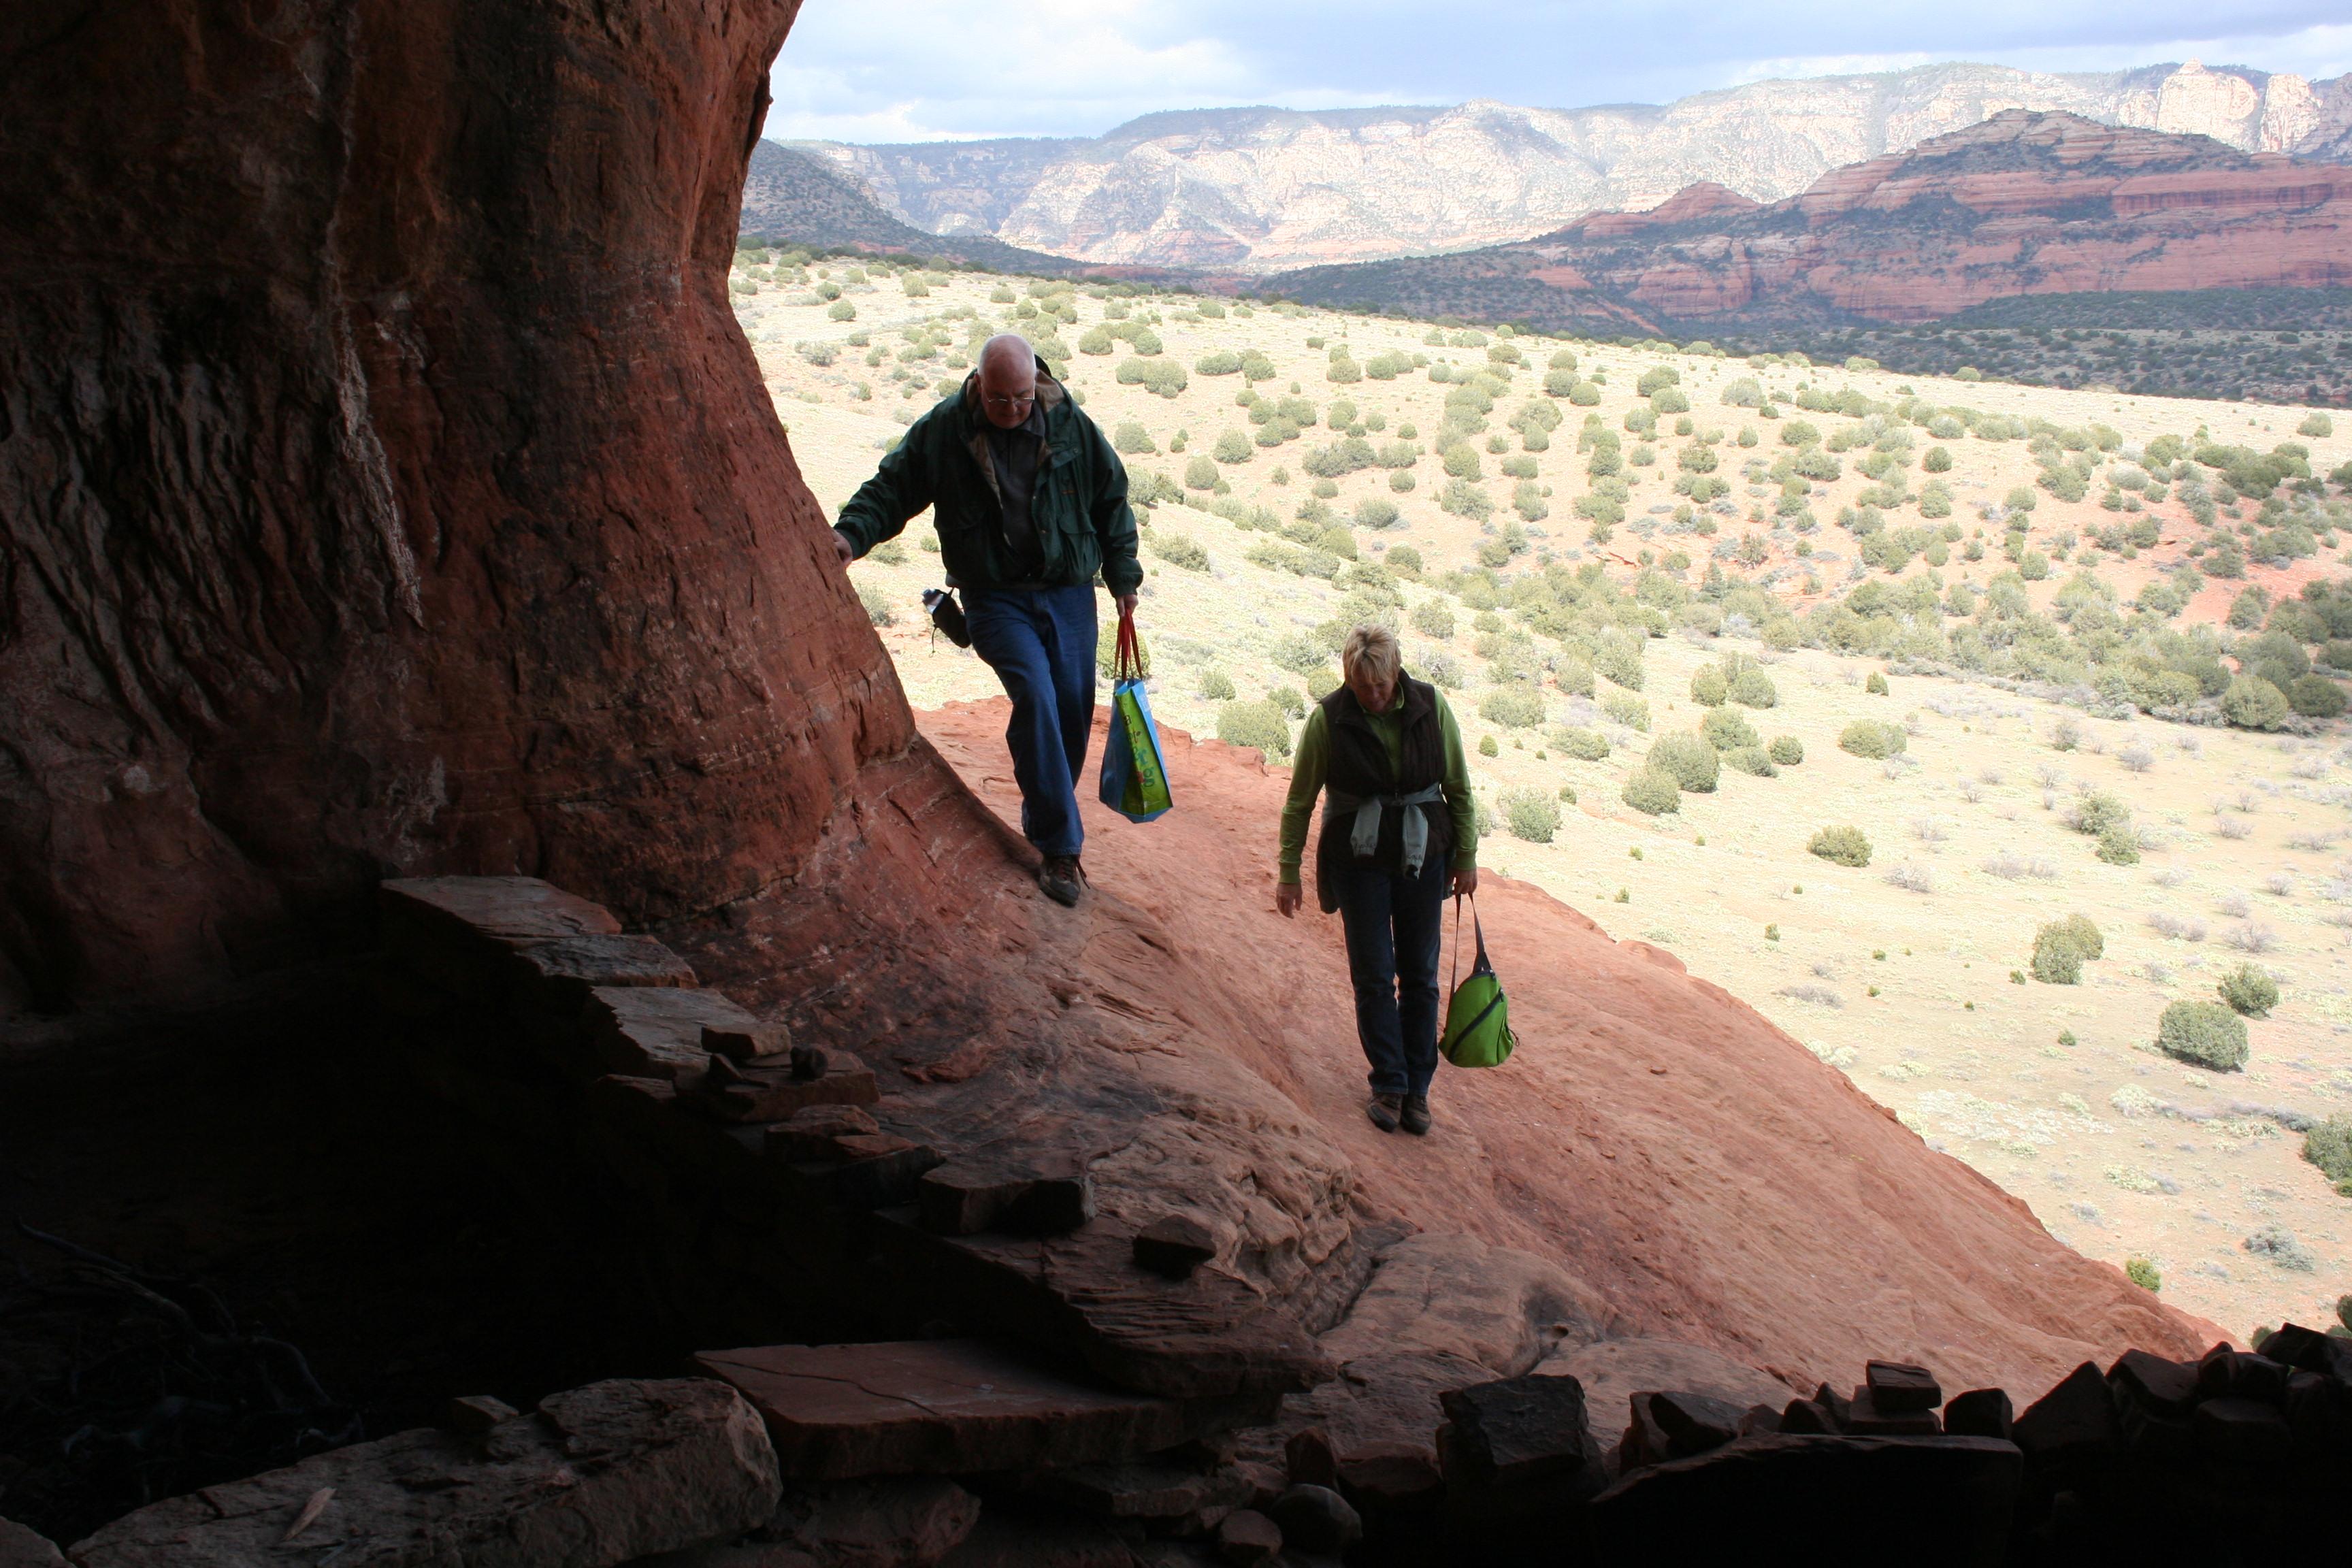 Walking to Shaman's Cave